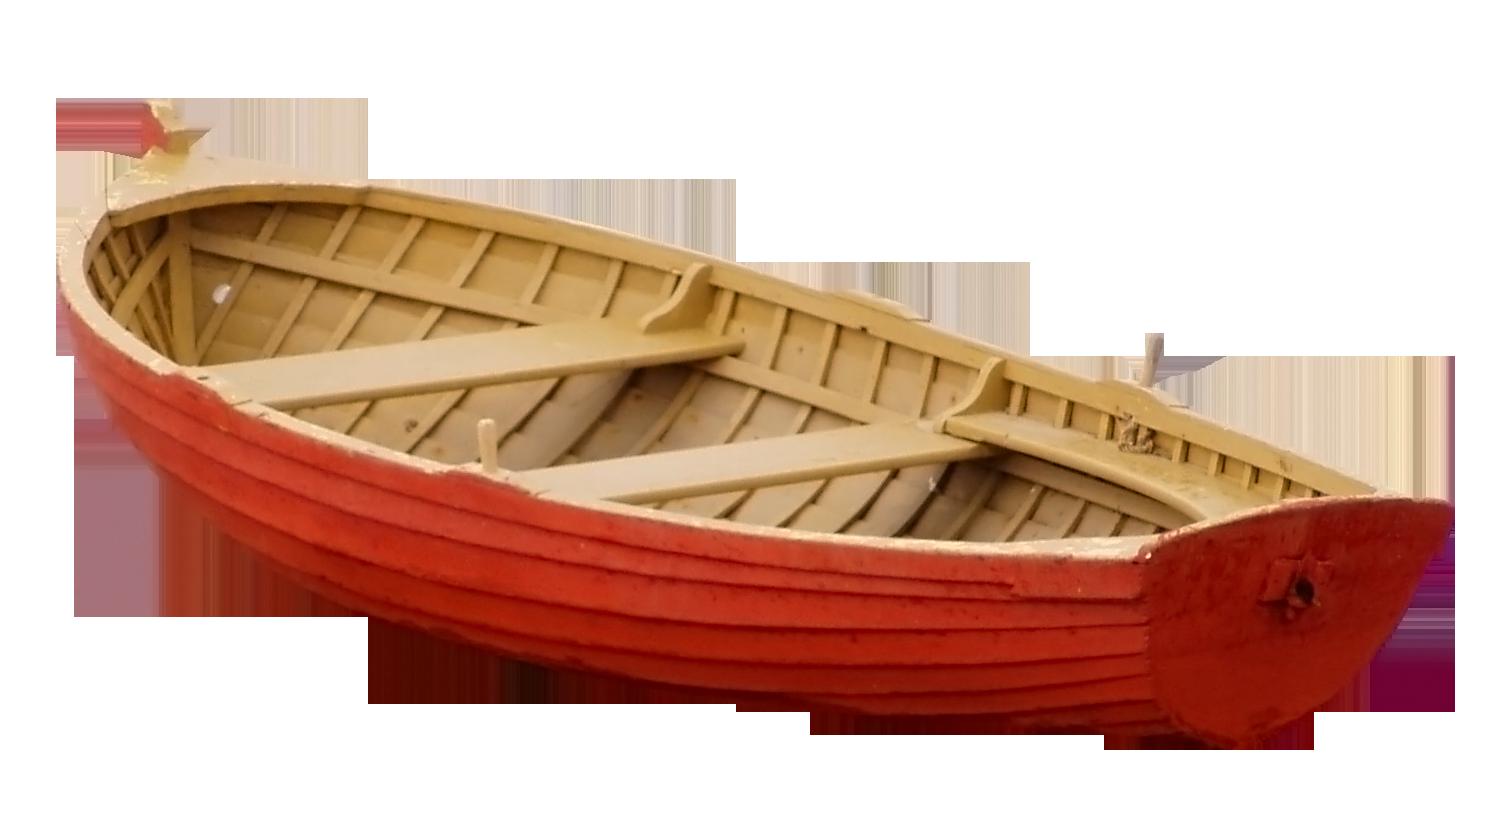 Boat PNG Image